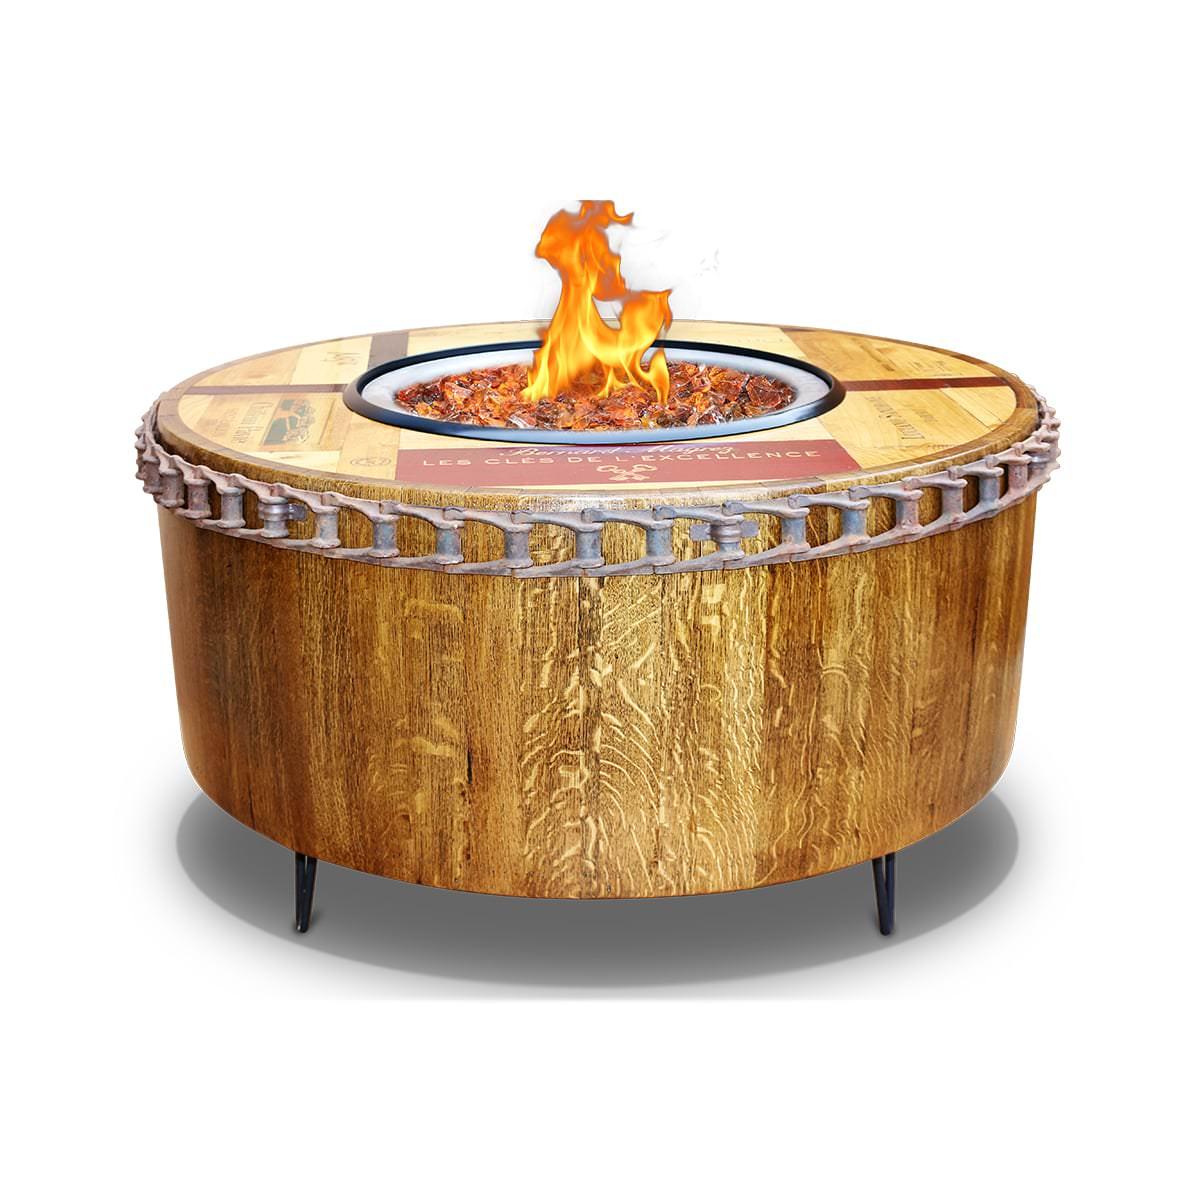 Fullsize Of Wine Barrel Fire Pit